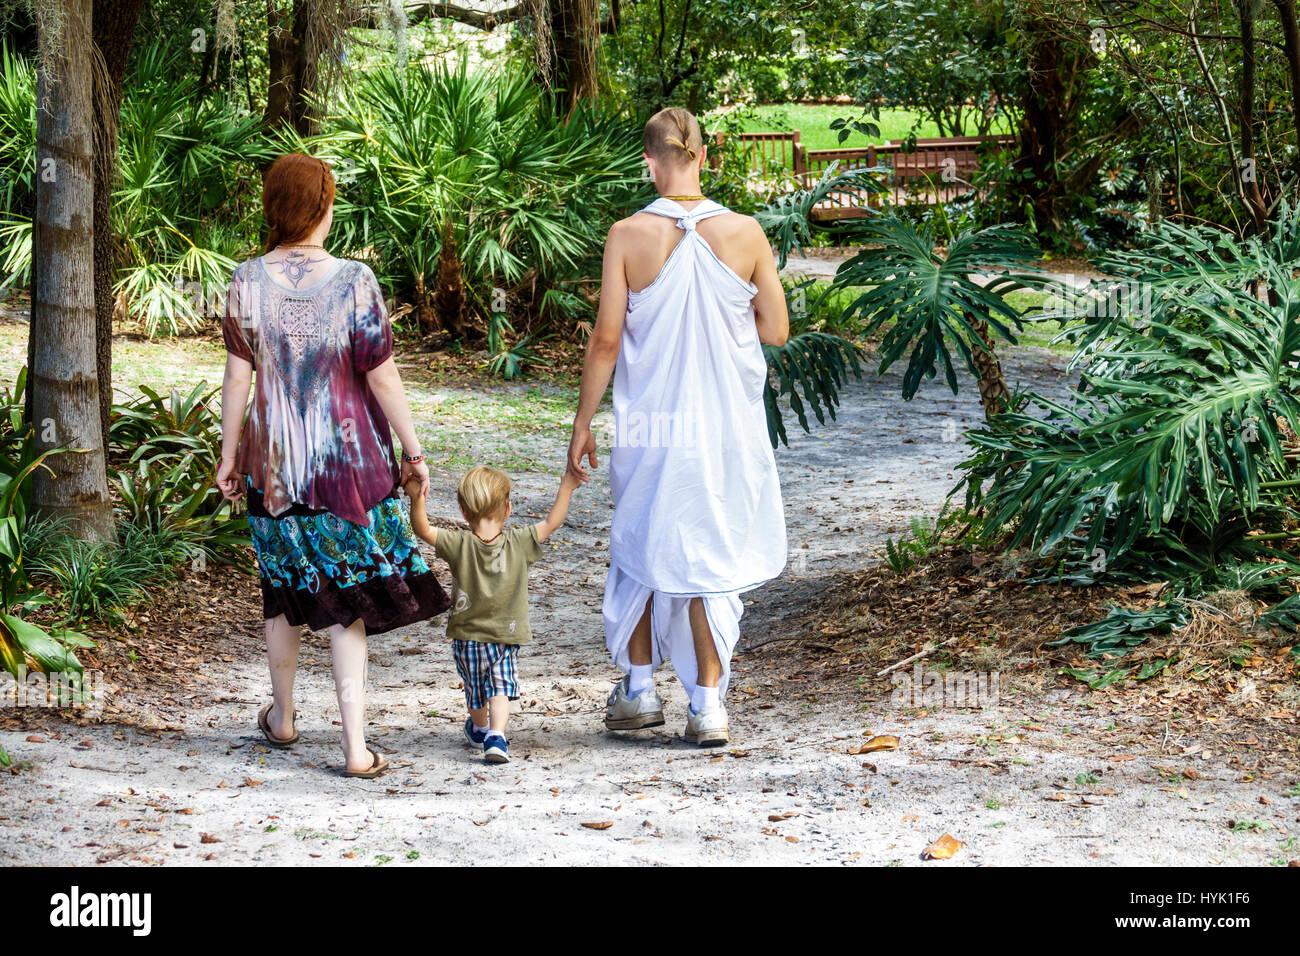 Winter Park Orlando Florida Mead Botanical Garden Nature Pathway Vegetation  Woman Man Boy Toddler Family Monk Robe Religion Walking Hare Krishnas Kris